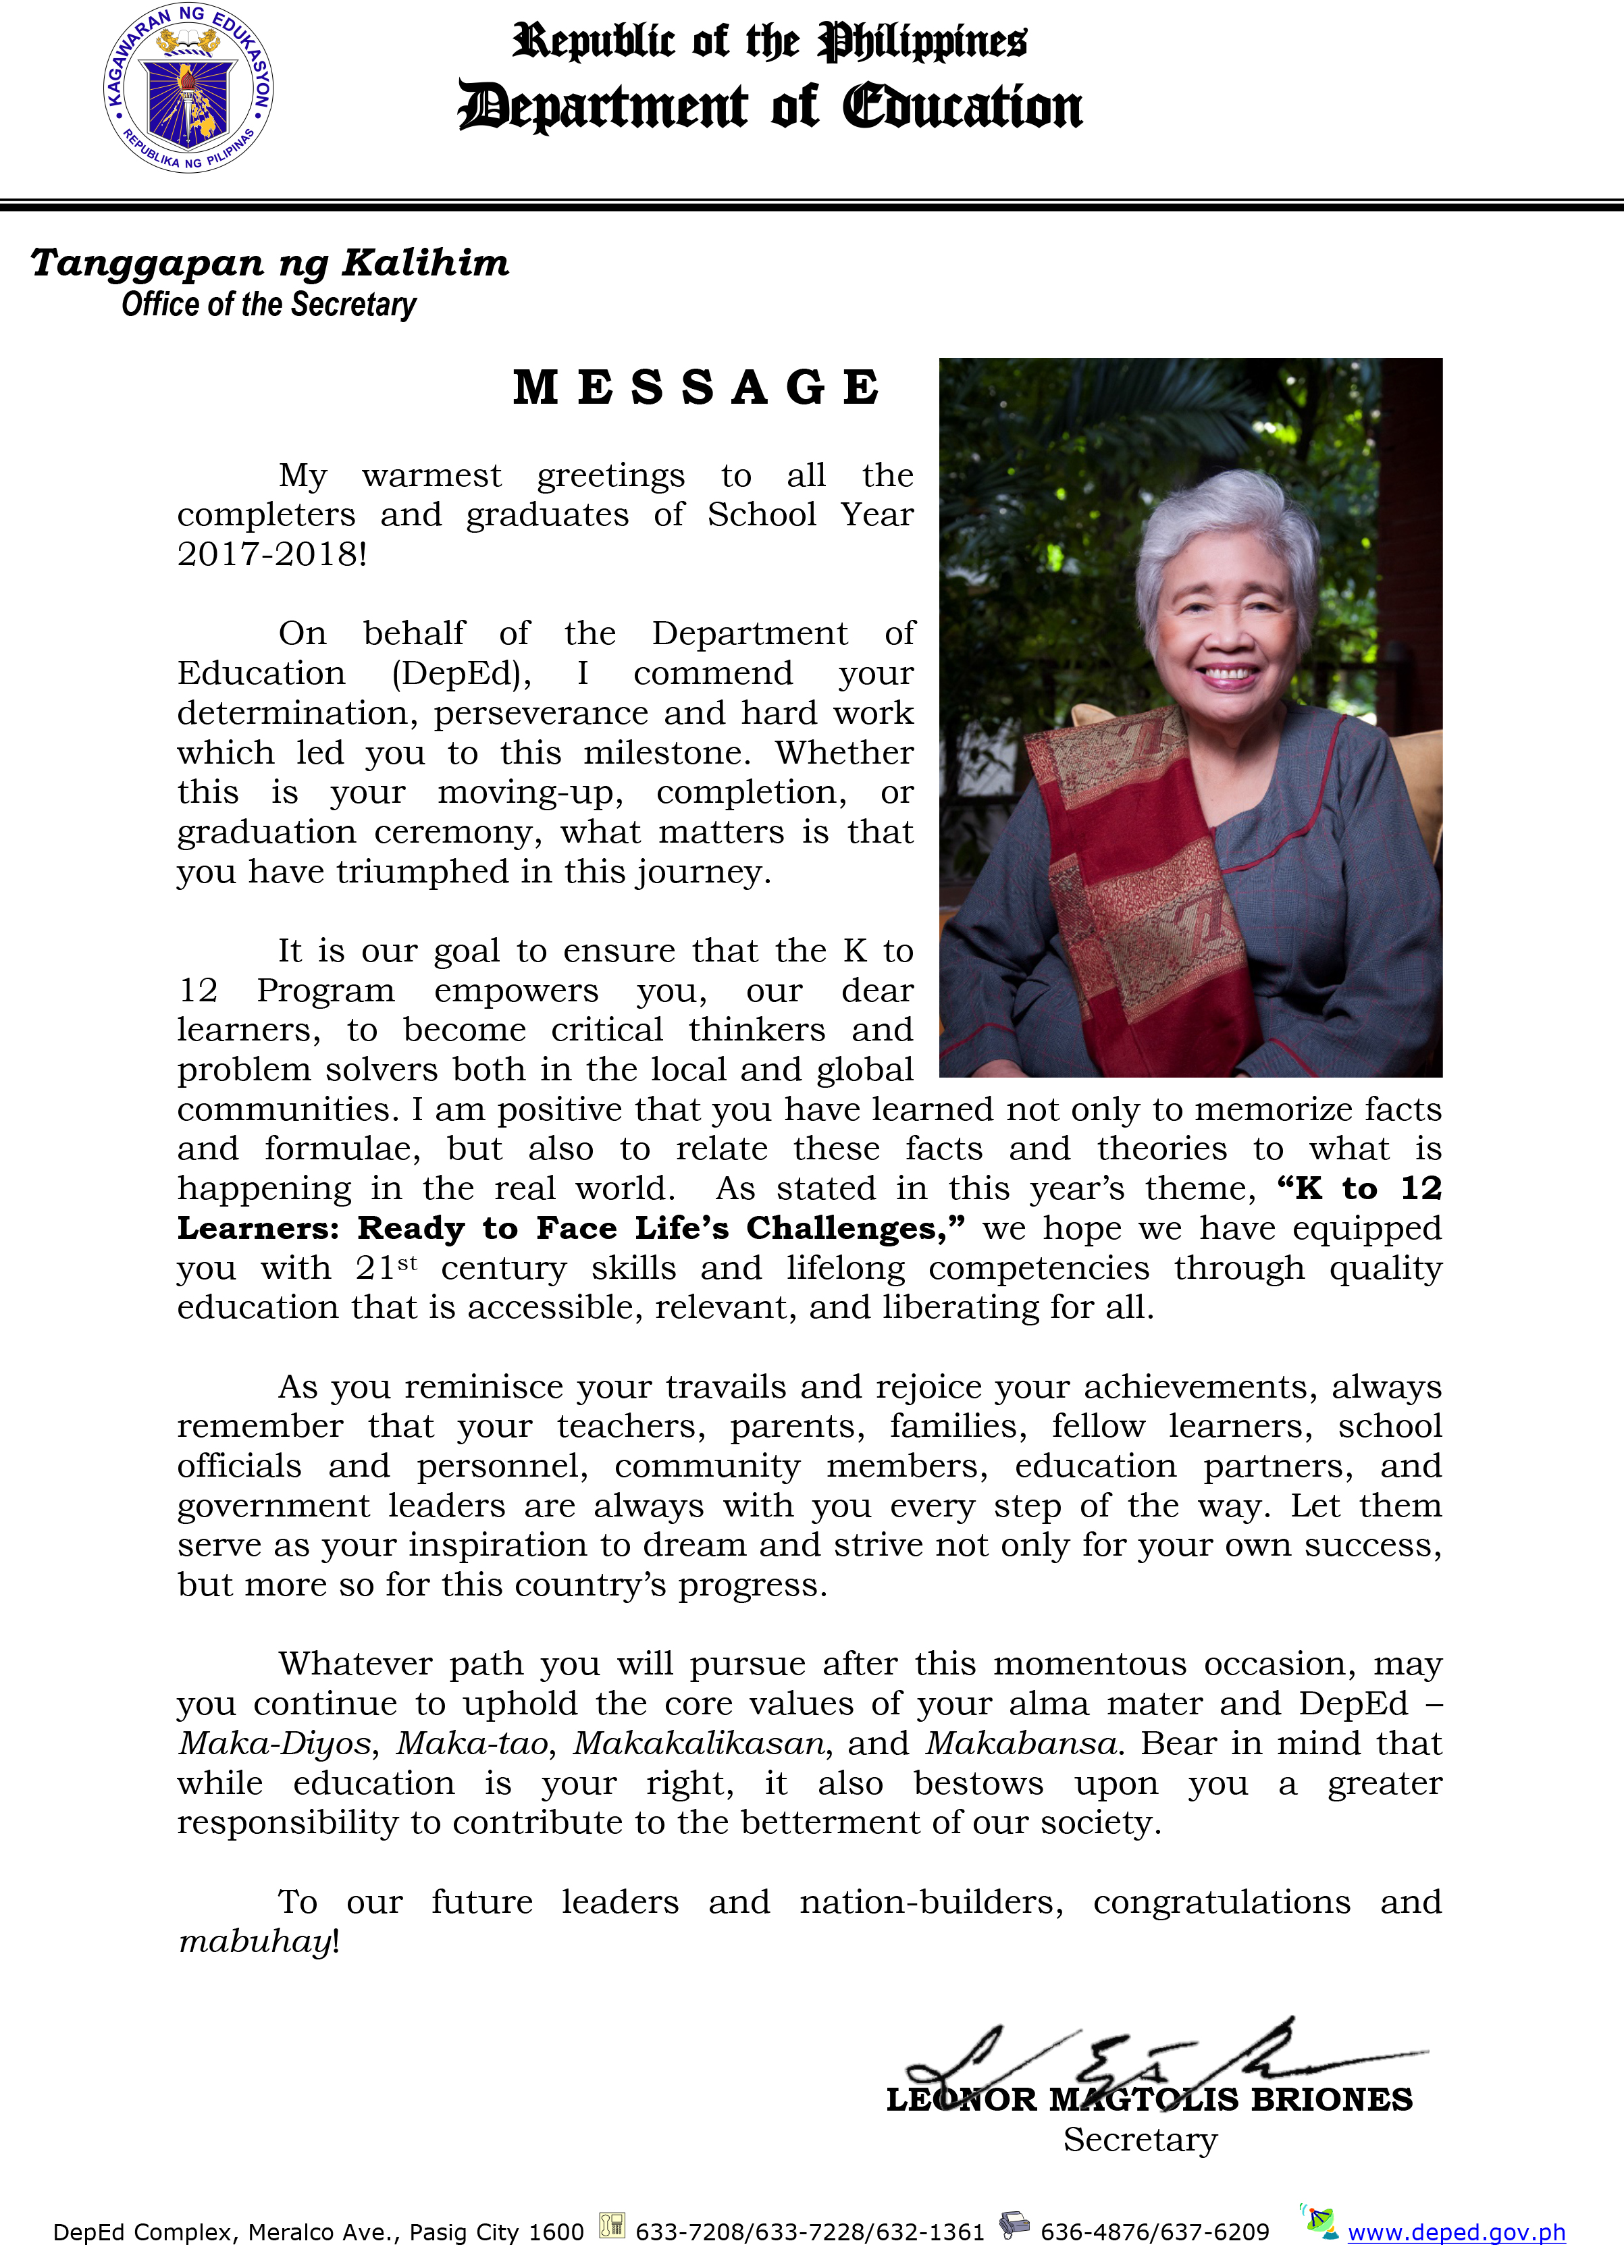 2018 graduation message of secretary leonor magtolis briones m4hsunfo